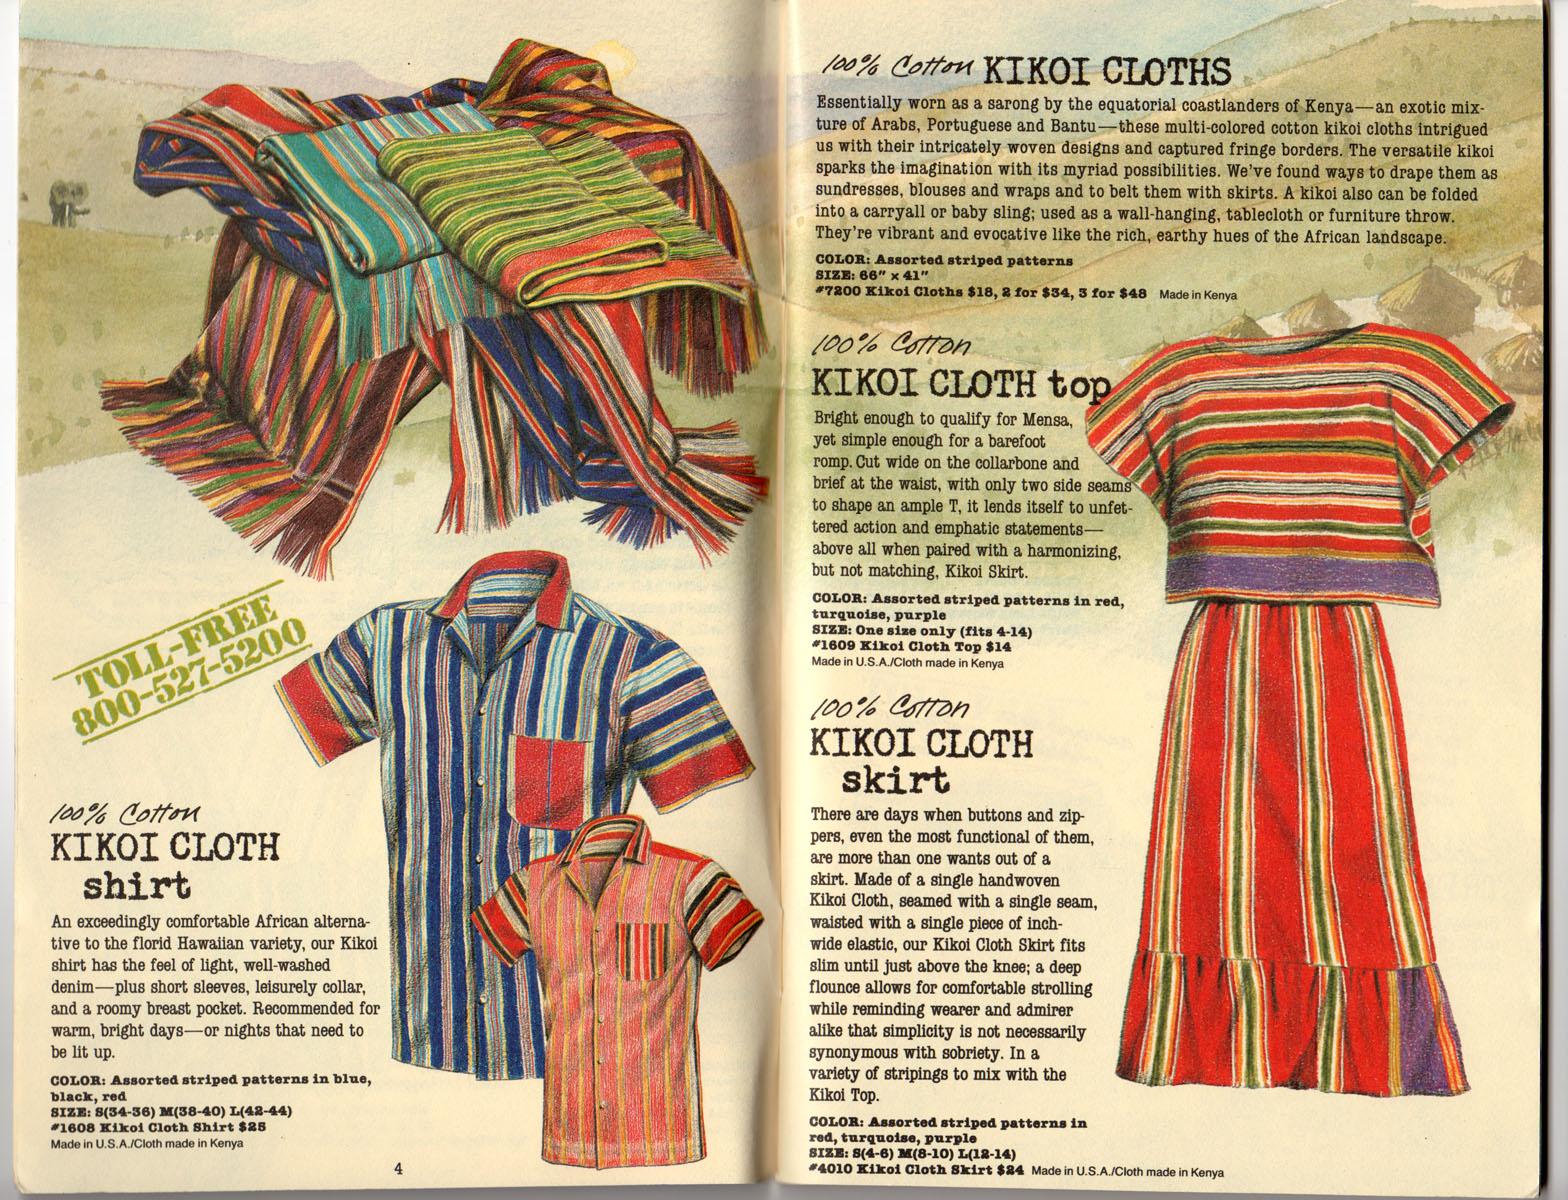 Banana Republic Summer 1985 Update #24 Kikoi Cloth